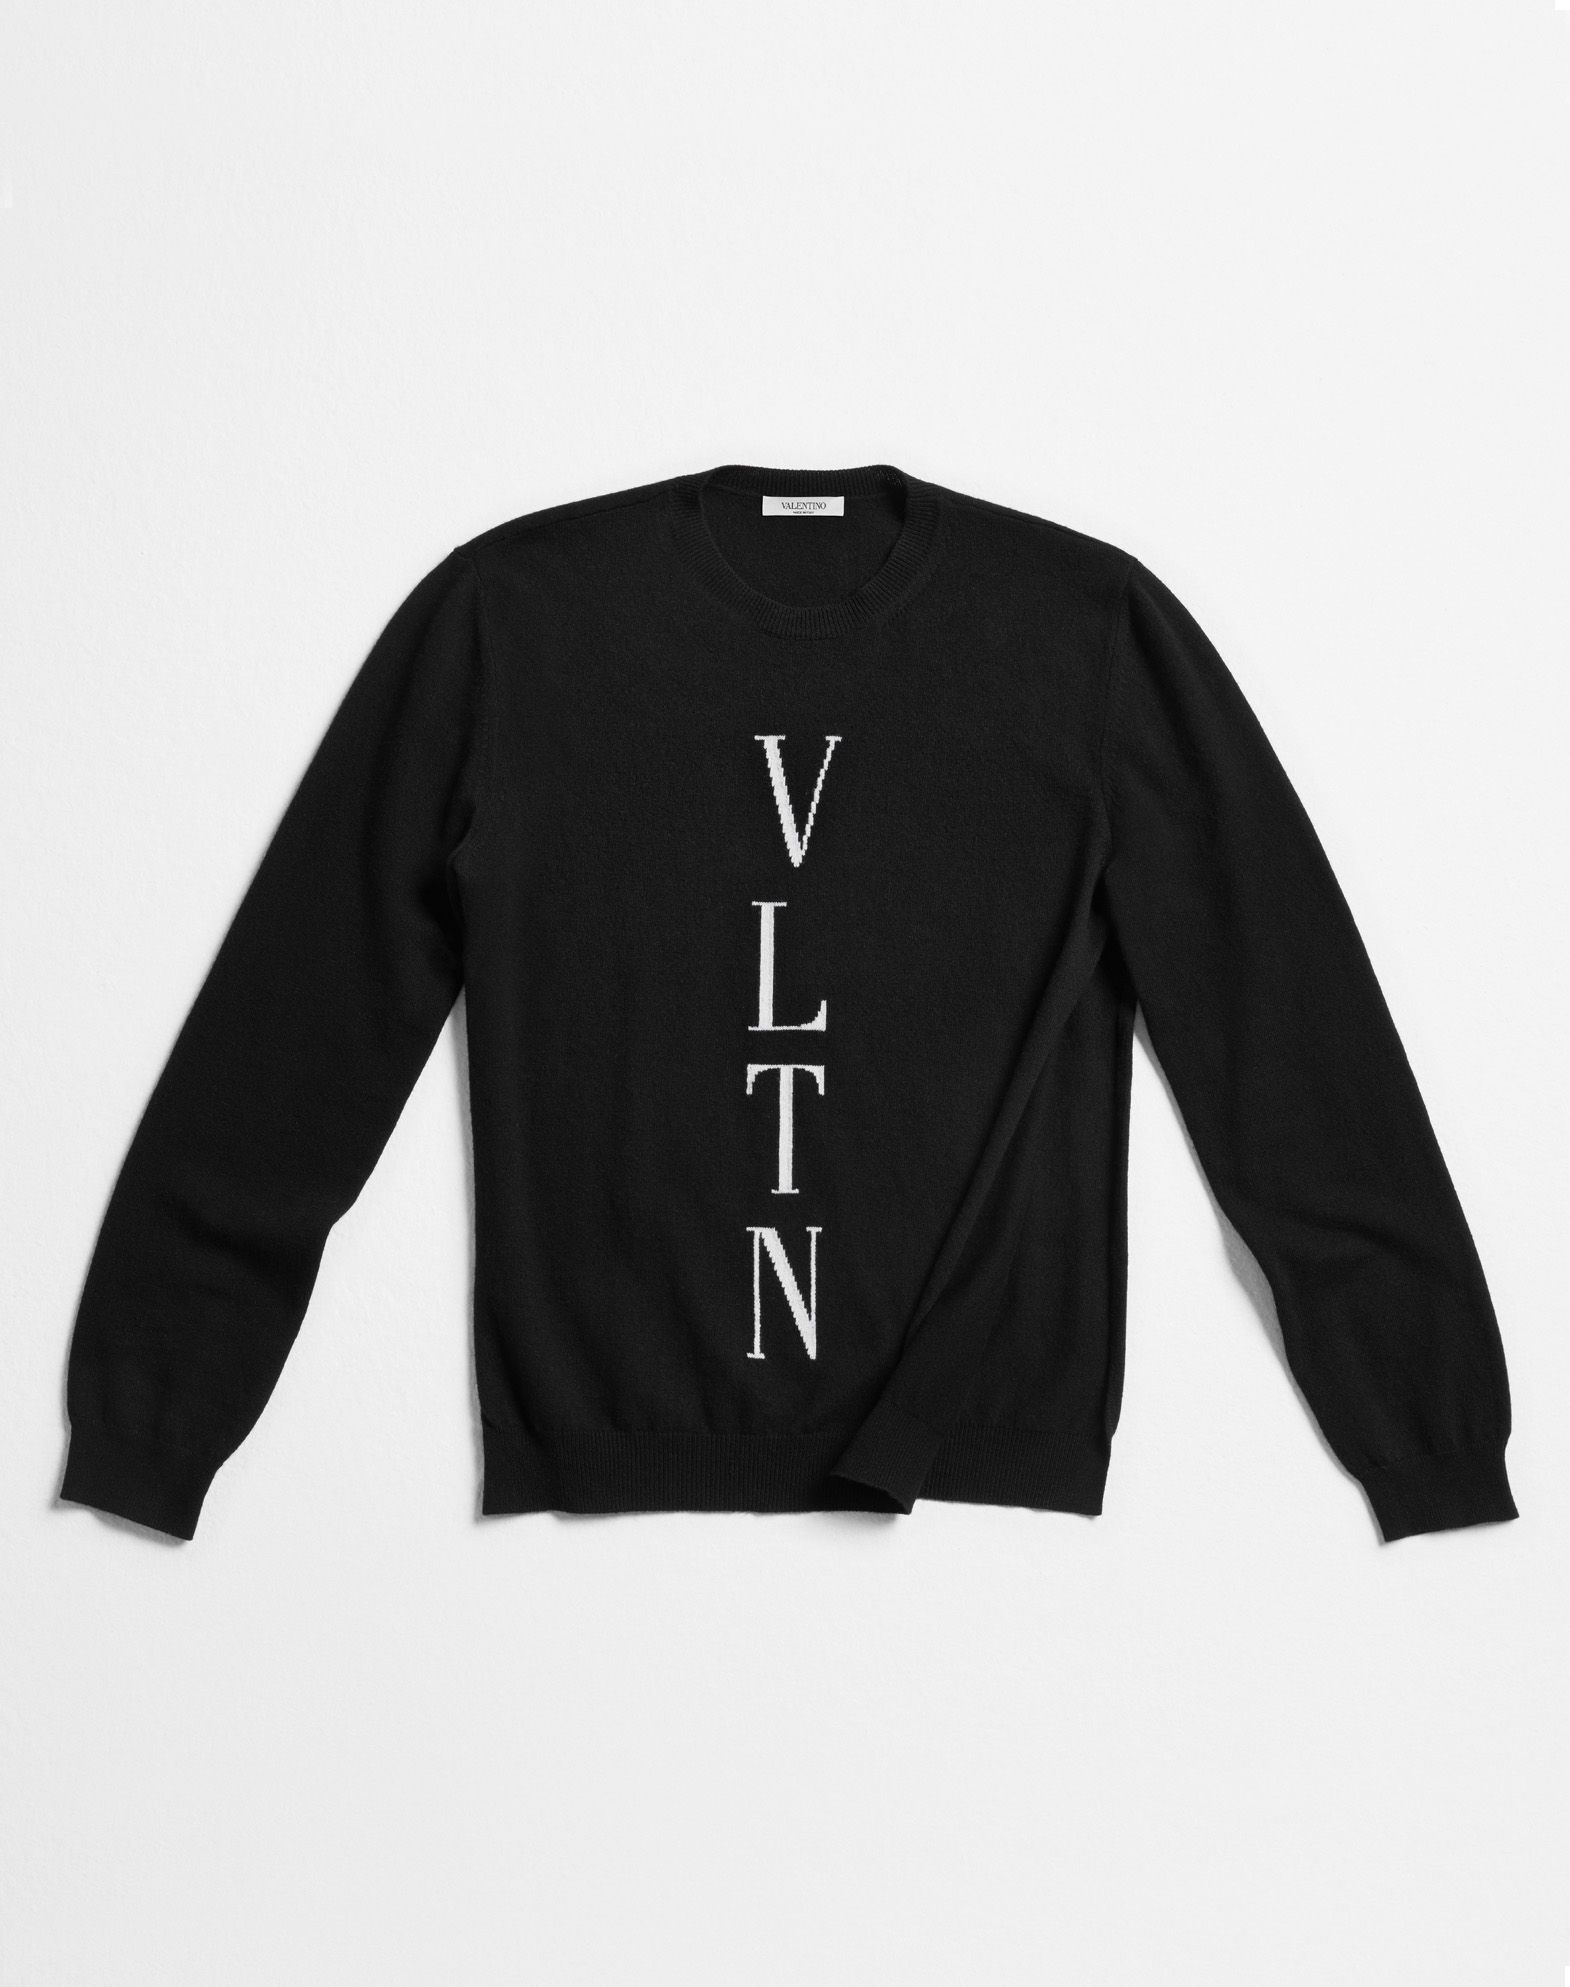 VALENTINO UOMO VLTN inlay sweater Knit top U l